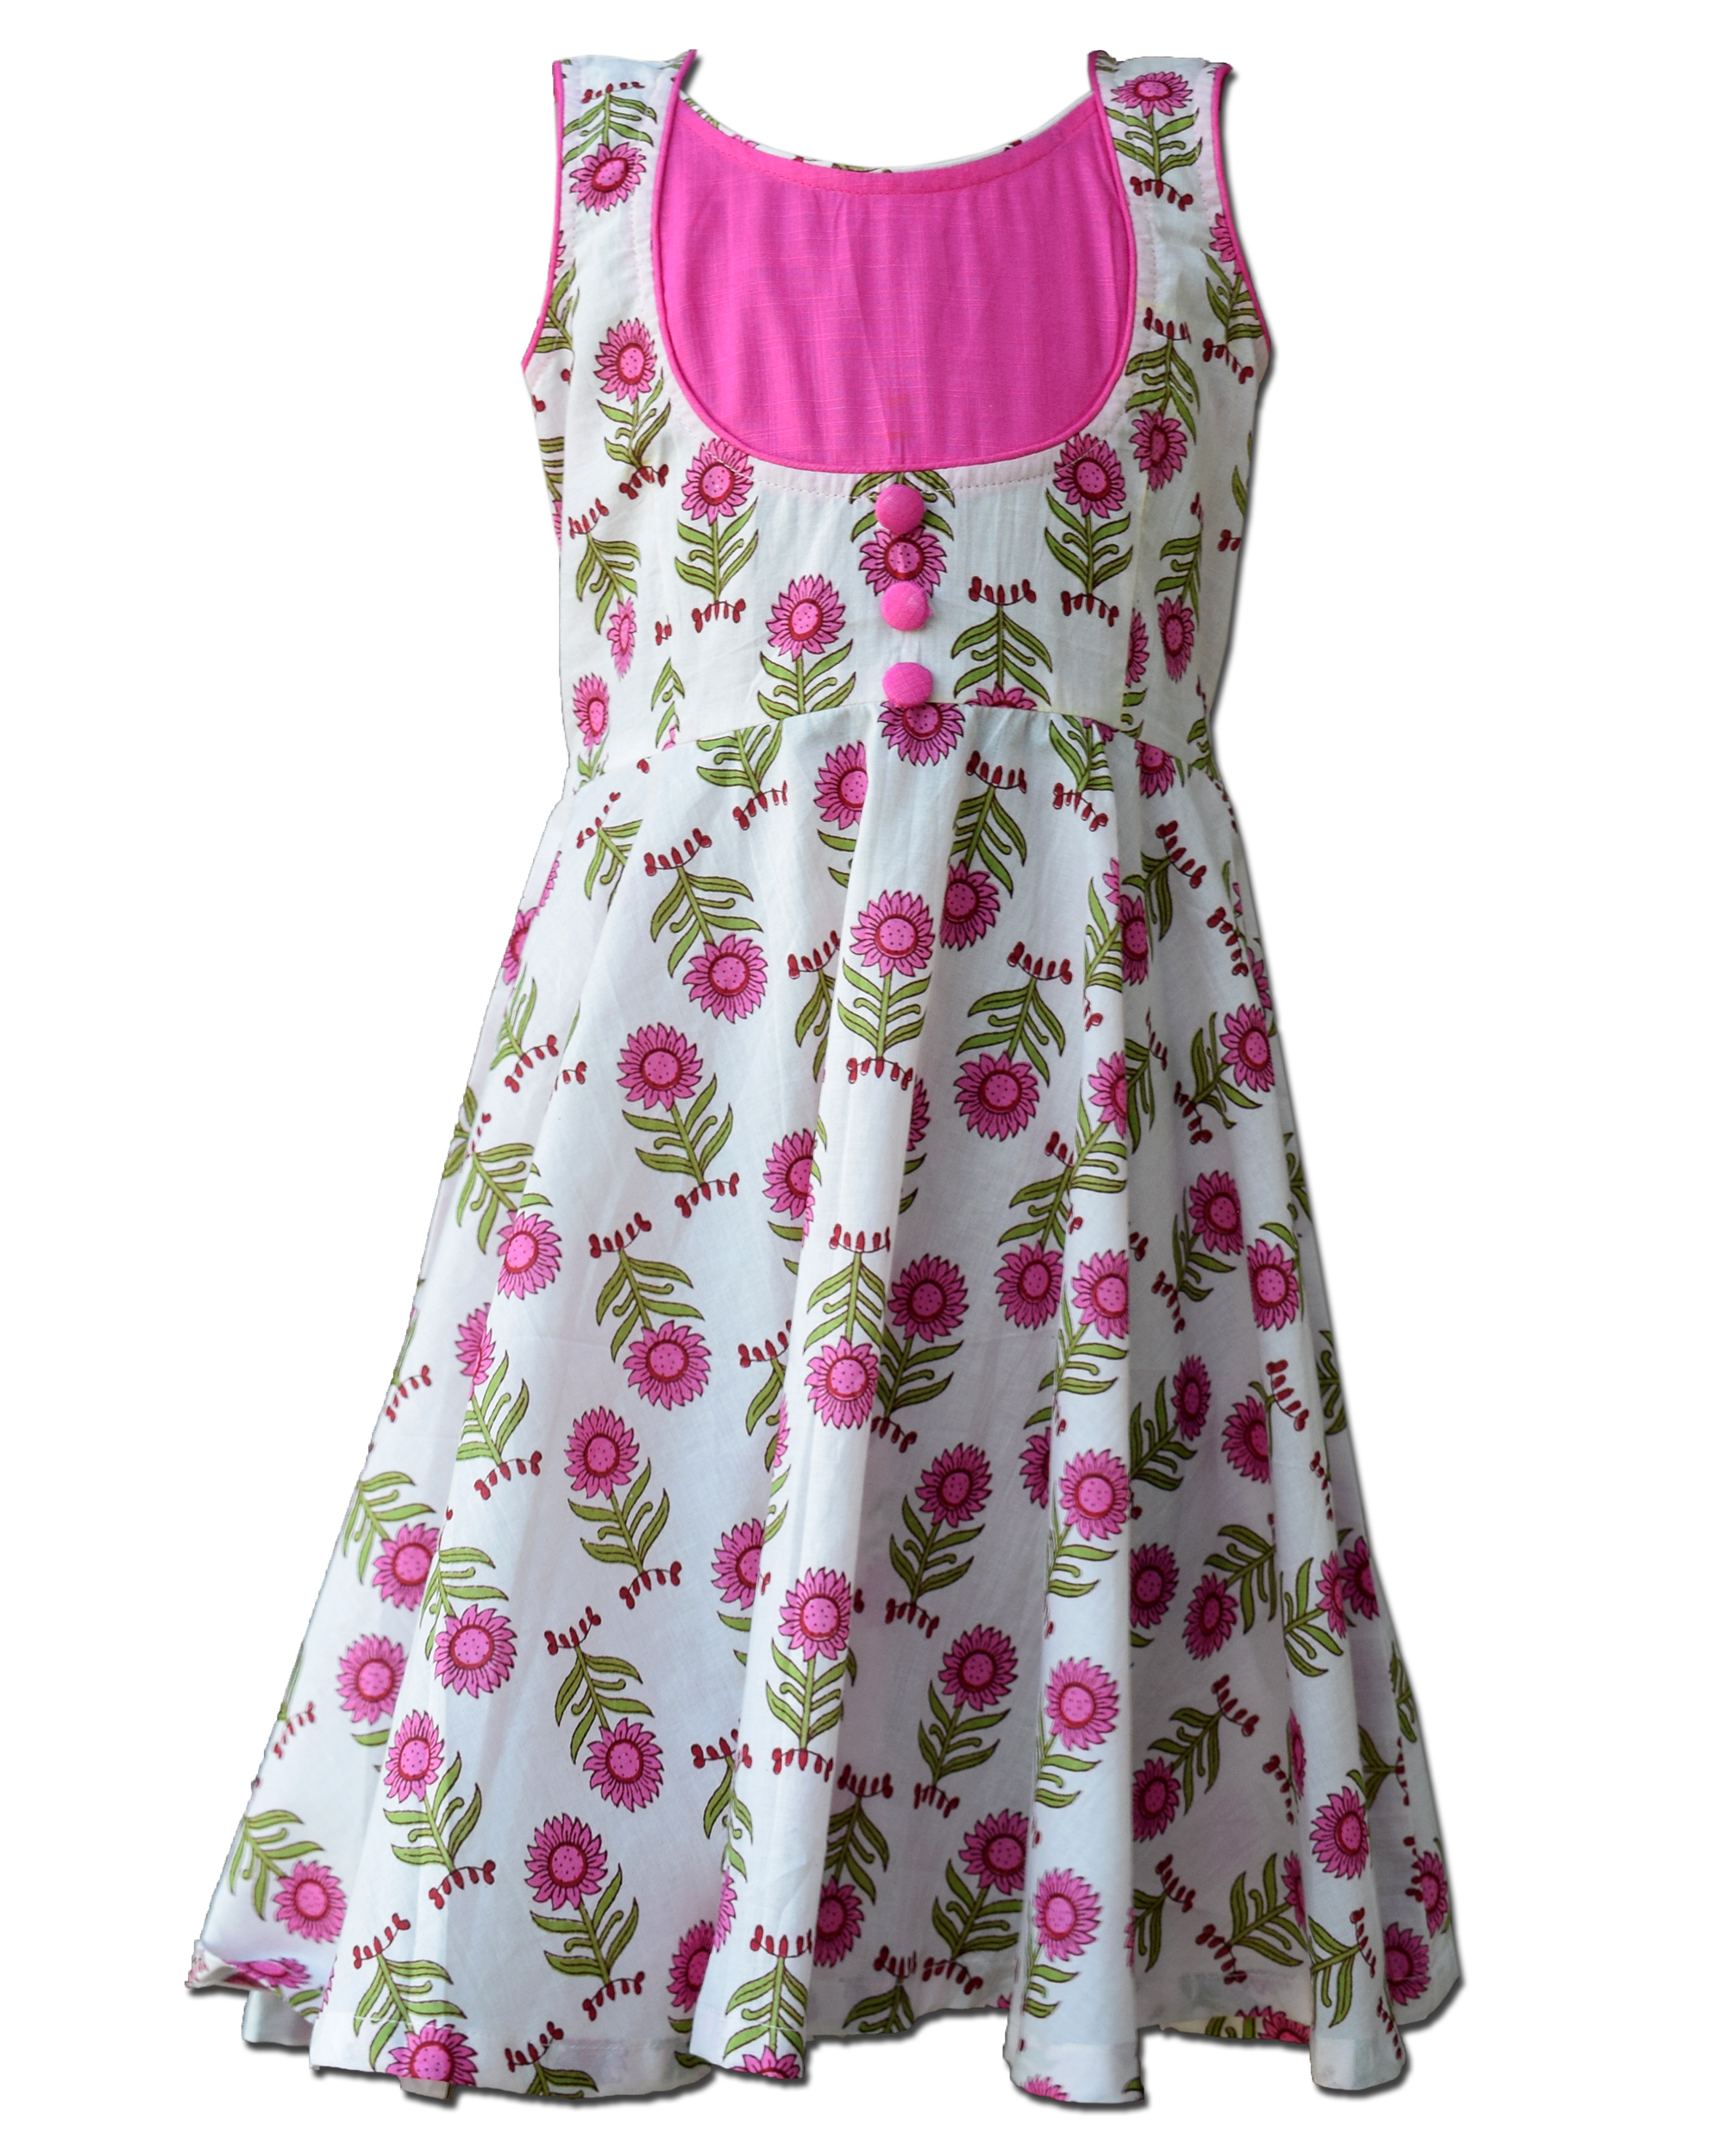 White and pink floral printed yoke dress